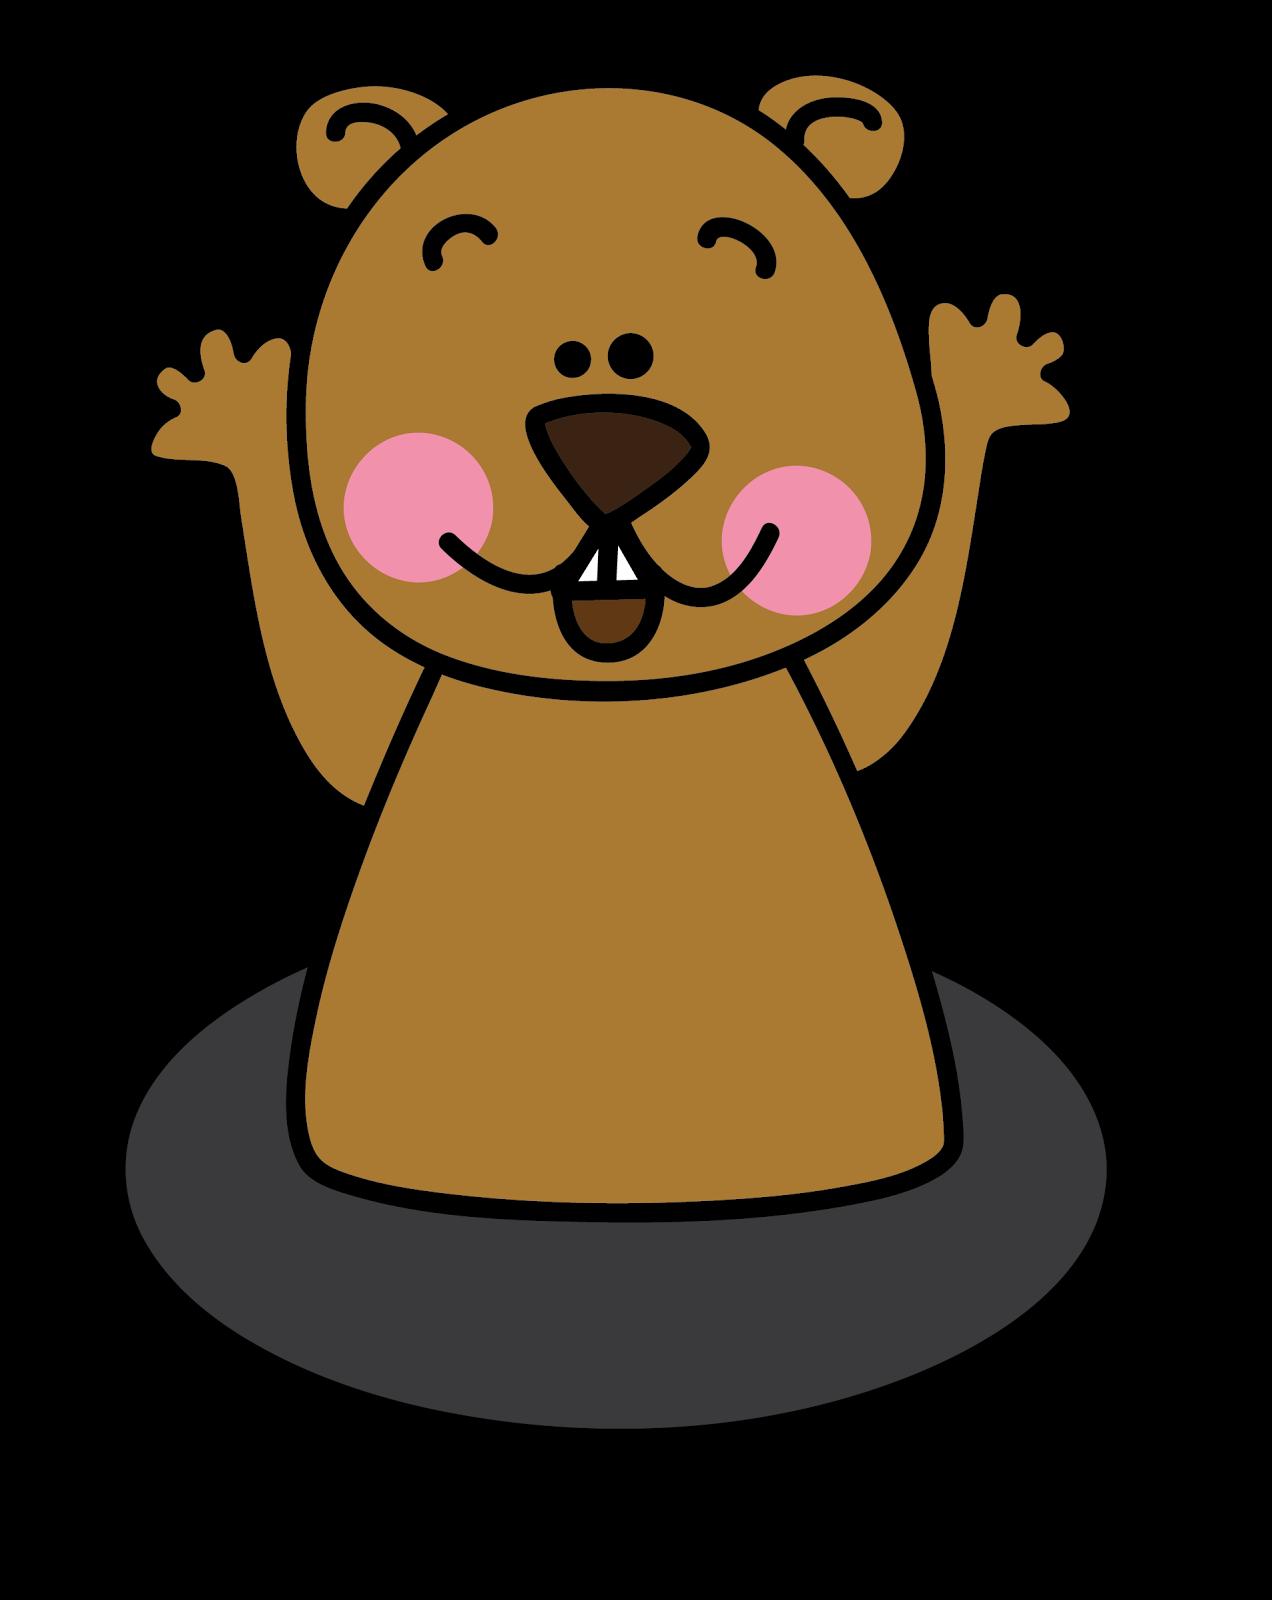 Mrs. Albaneseu0026#39;s Kindergarten Class: Mr. Groundhog is coming!!! Groundhog Shadow Clipart Images Pictures - Becuo